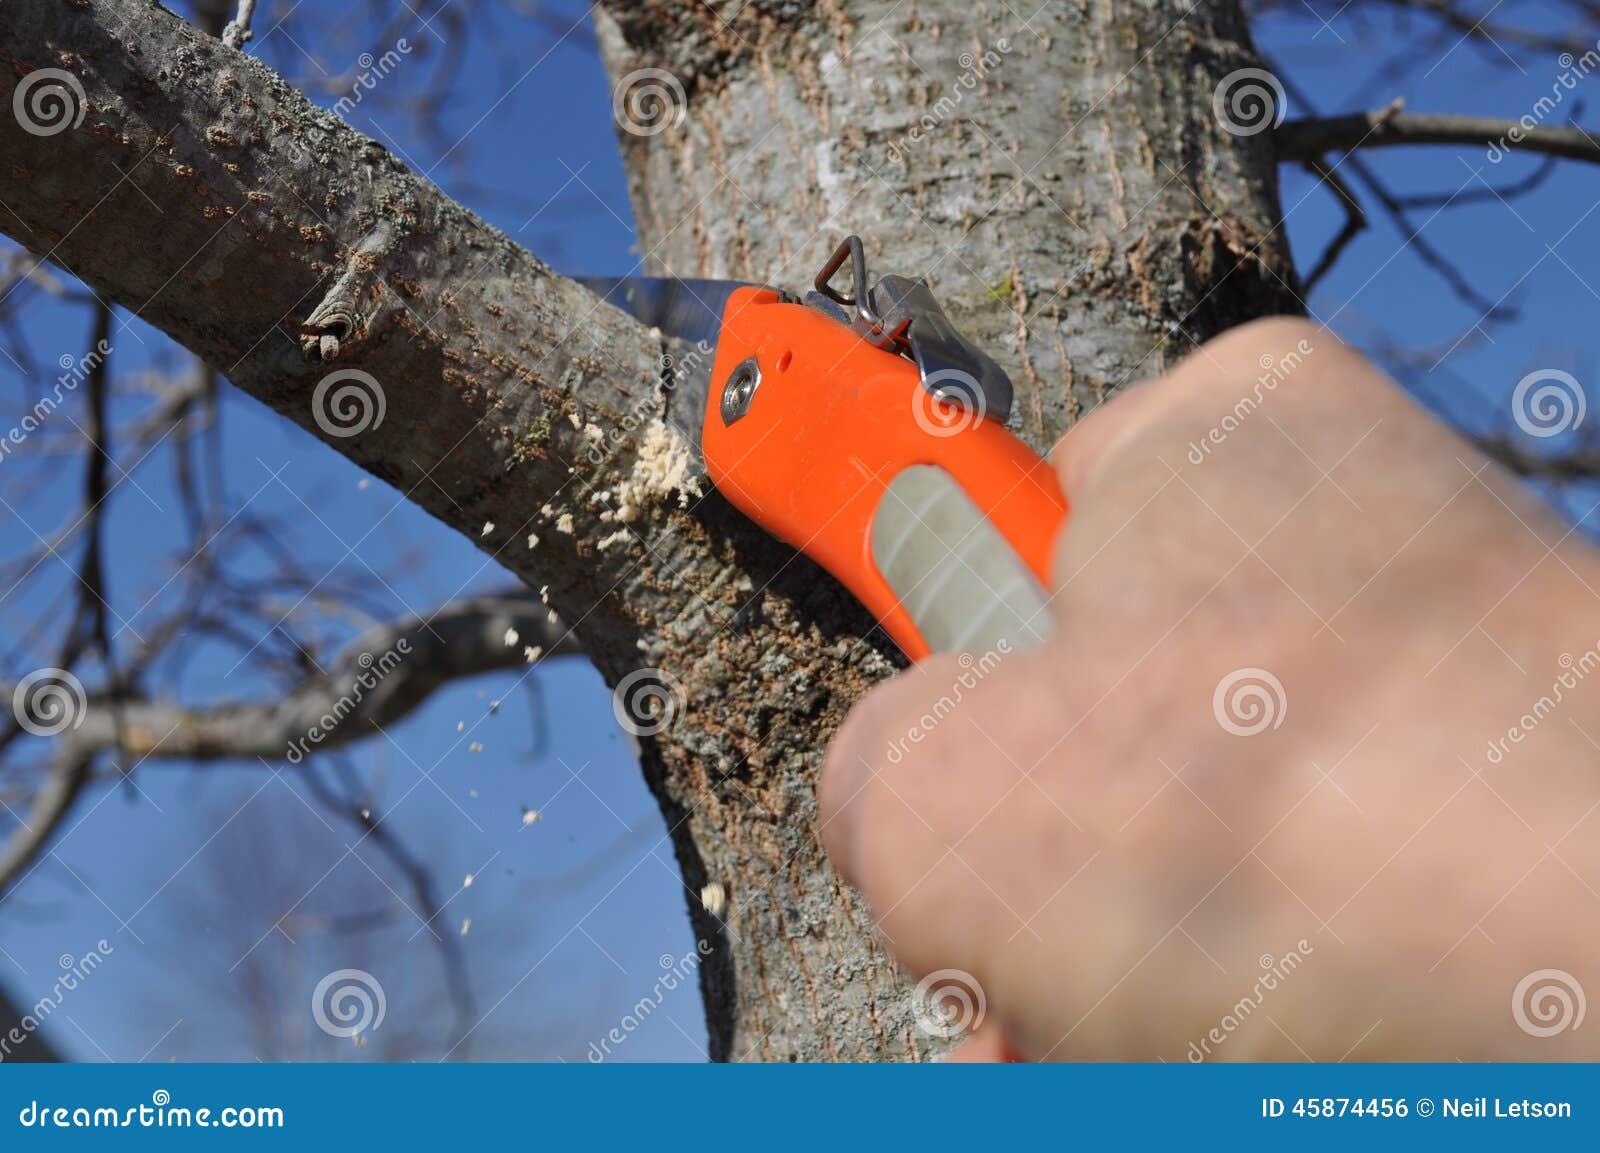 Tree Limb Being Properly Pruned